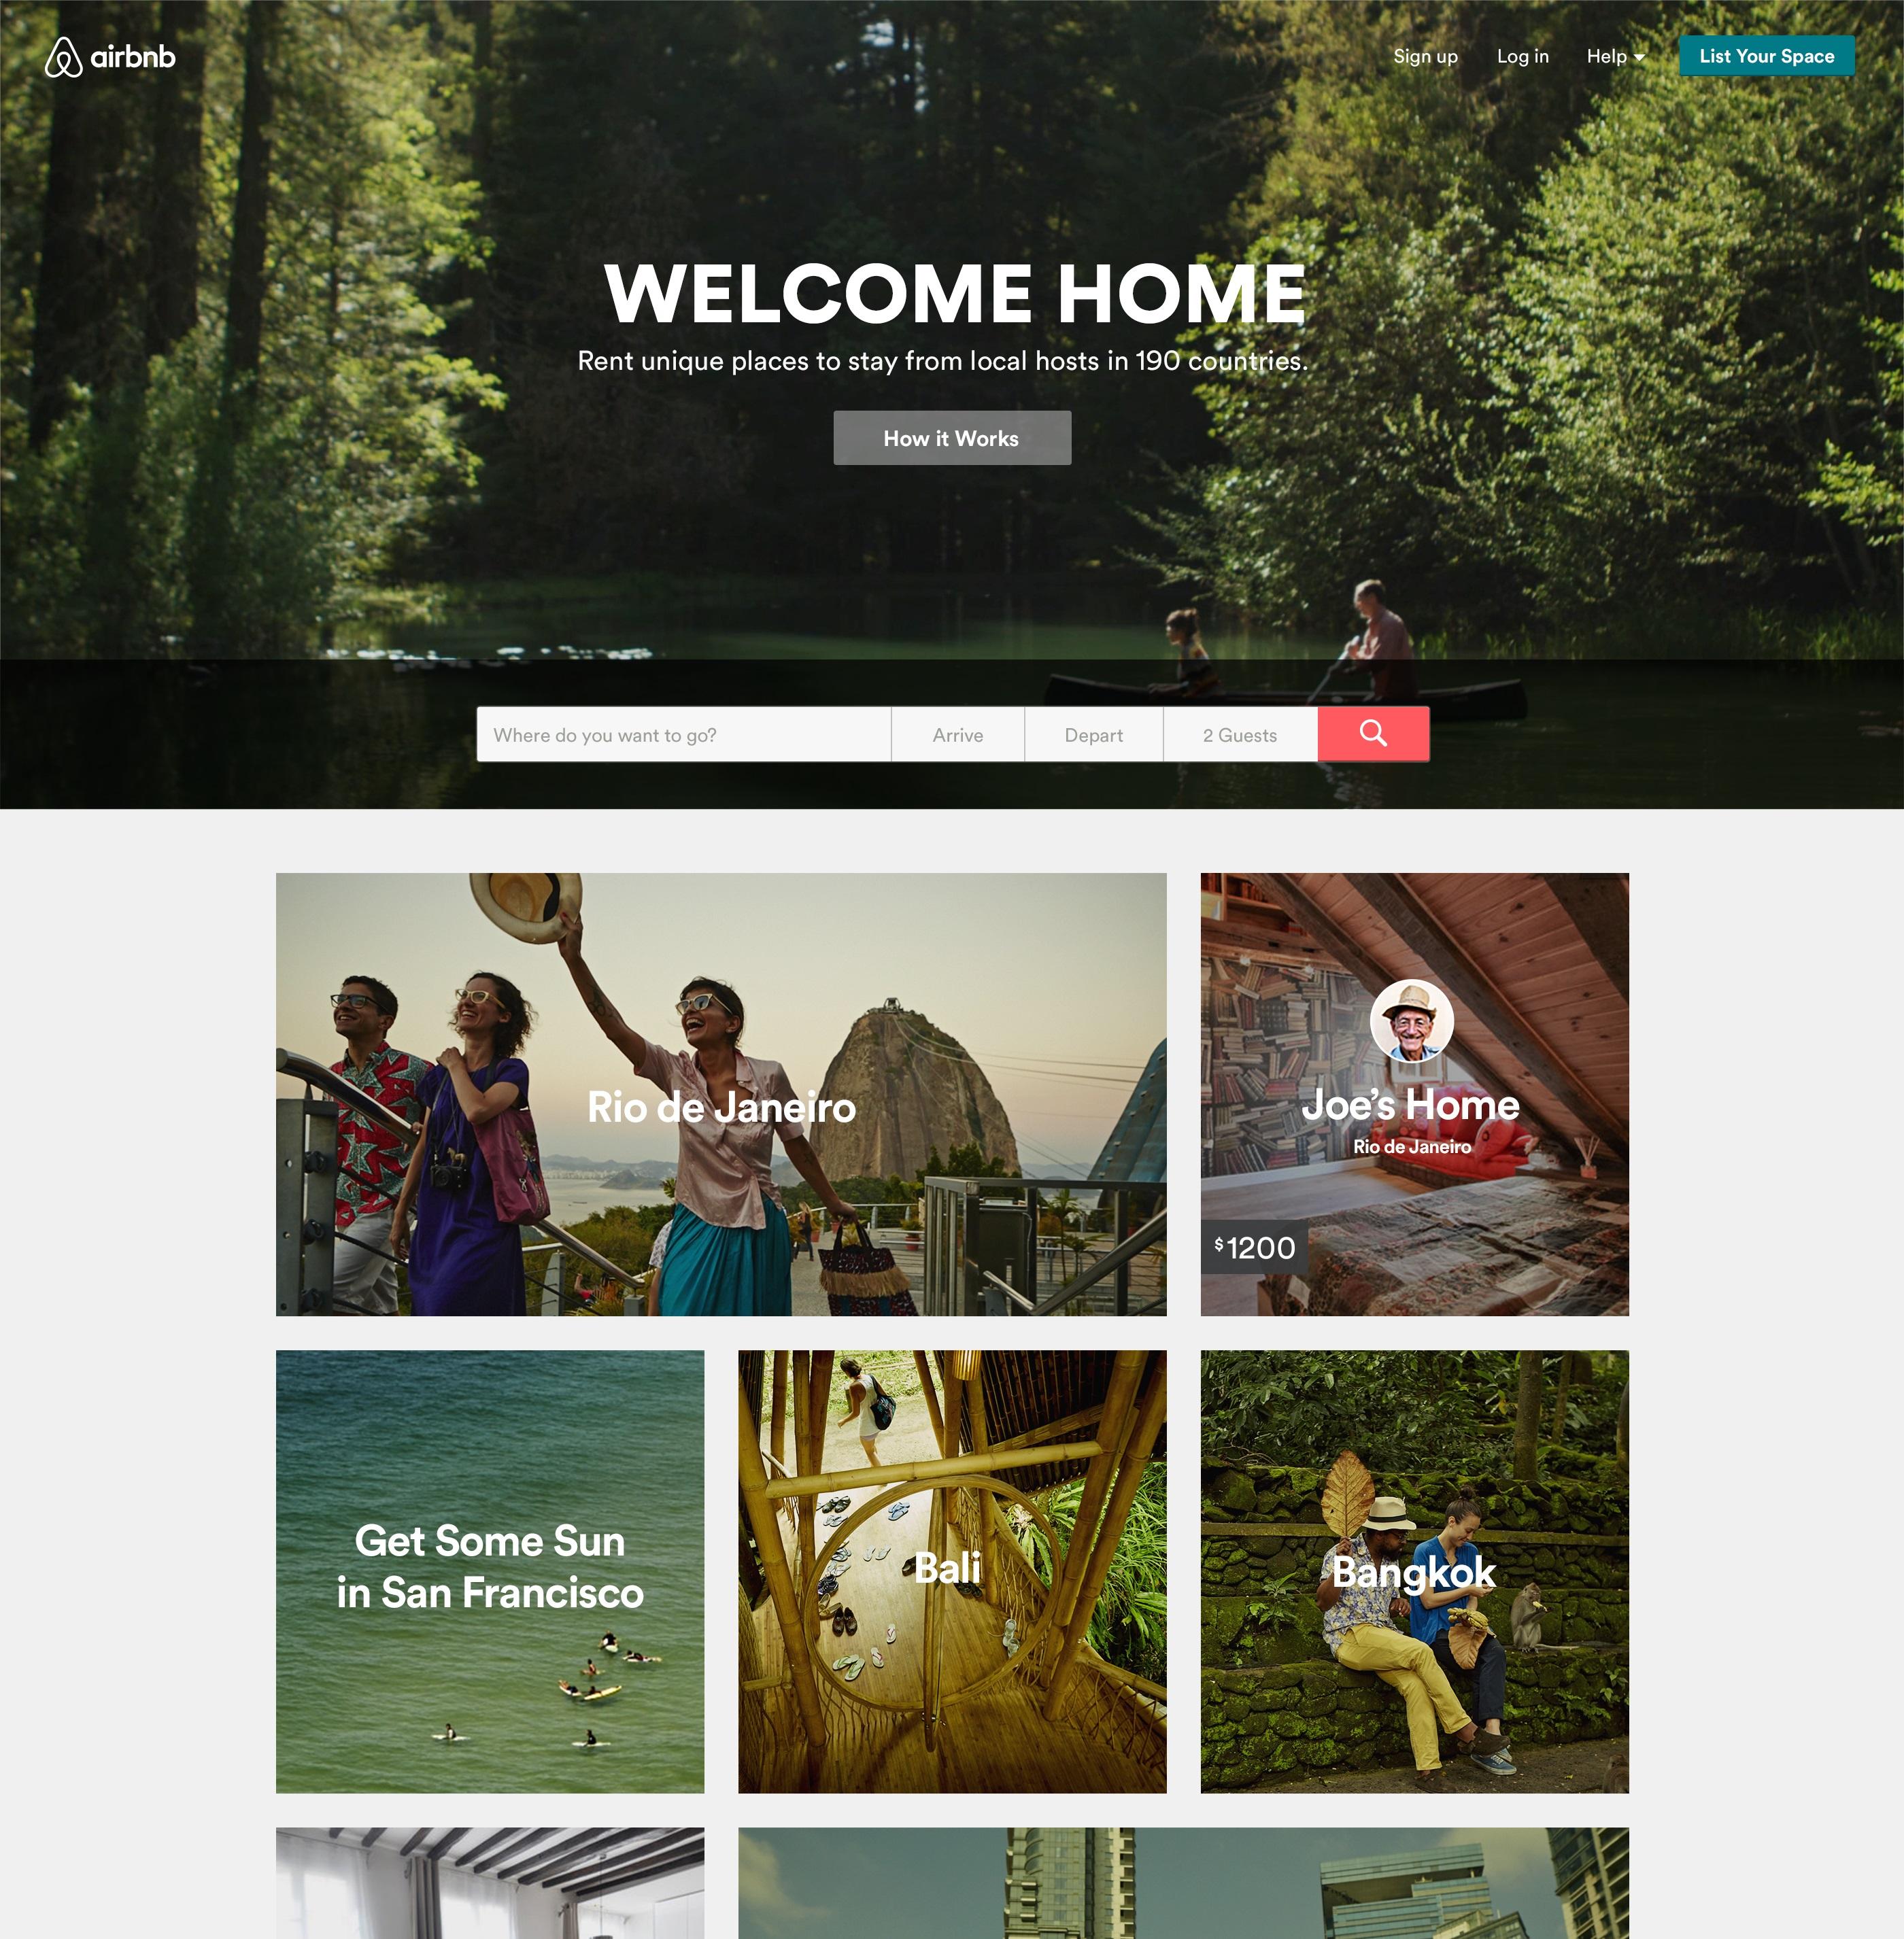 airbnb bald windows 10 universal app. Black Bedroom Furniture Sets. Home Design Ideas